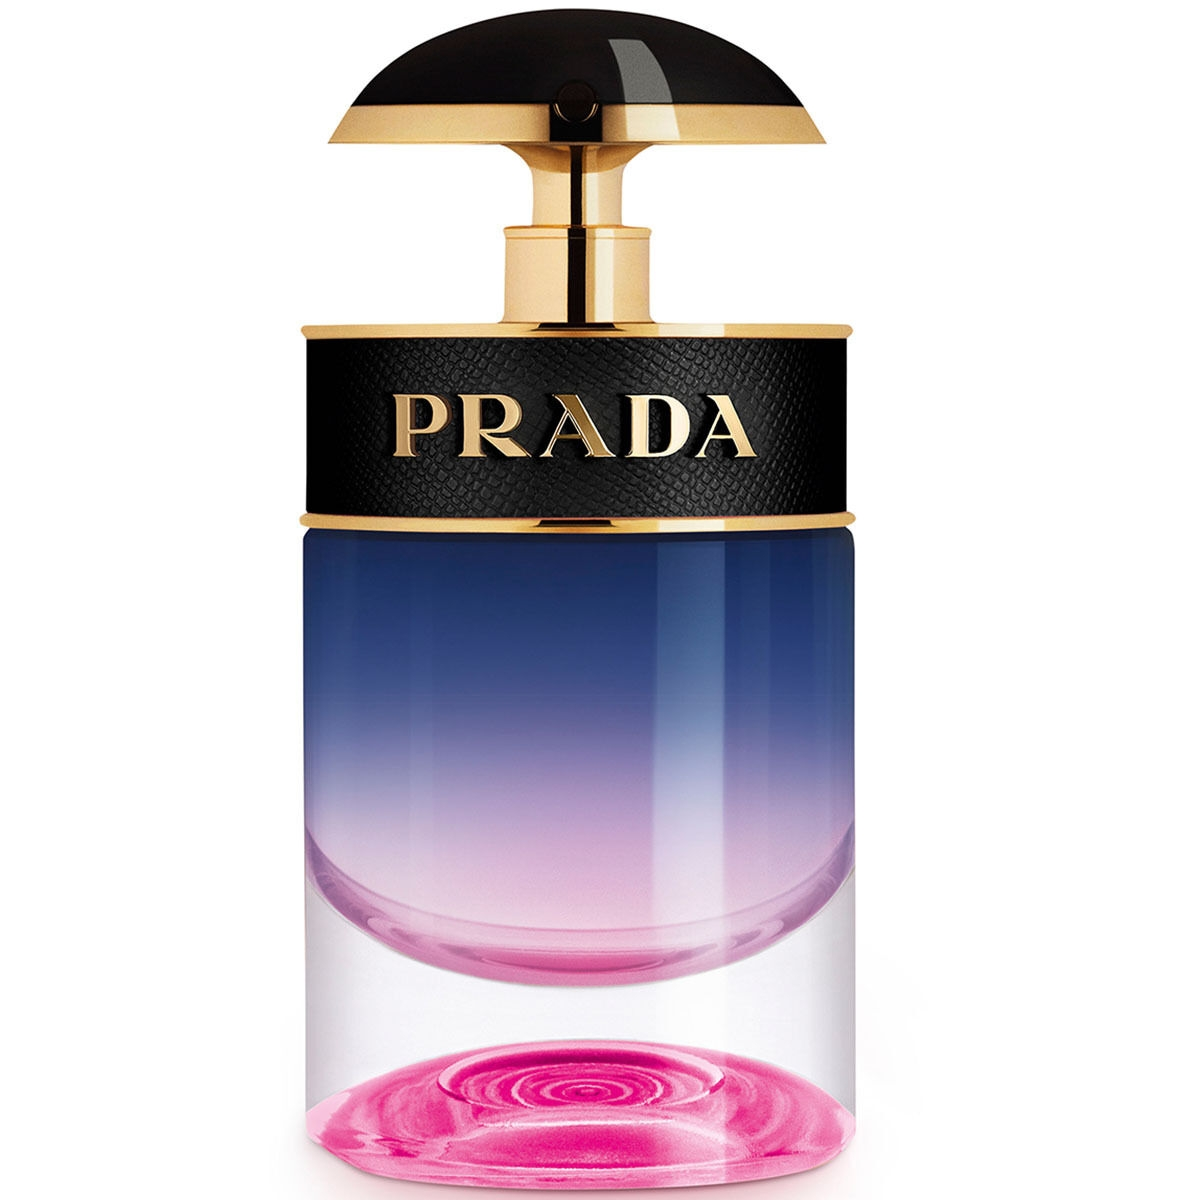 Prada Candy Night (W) edp 50ml